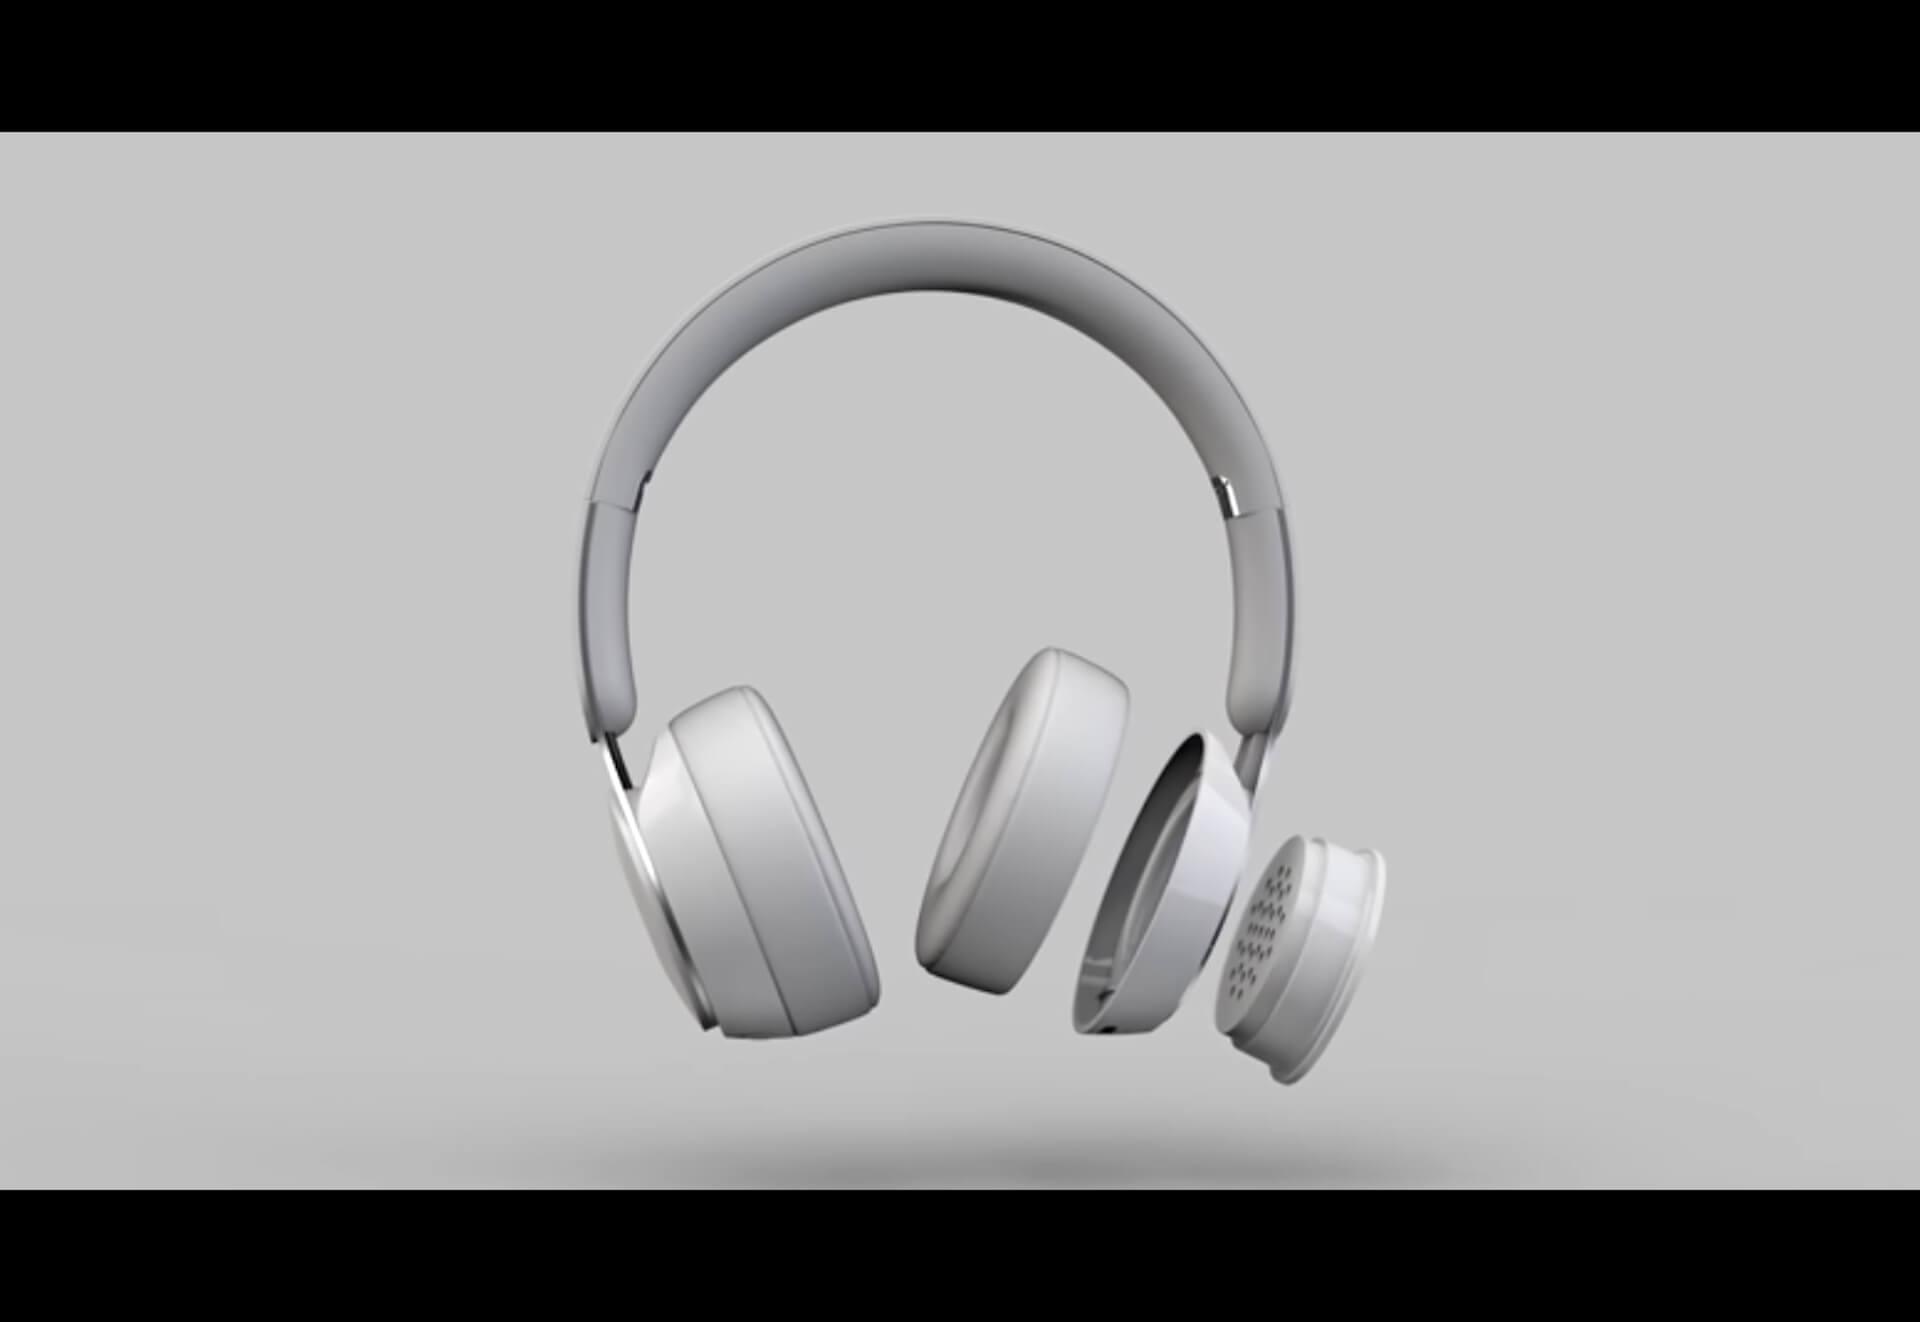 Apple初のオーバーイヤーヘッドホンAirPods Studioが6月の<WWDC>で発表?大量生産がすでにスタートか tech200525_airpodsstudio_main